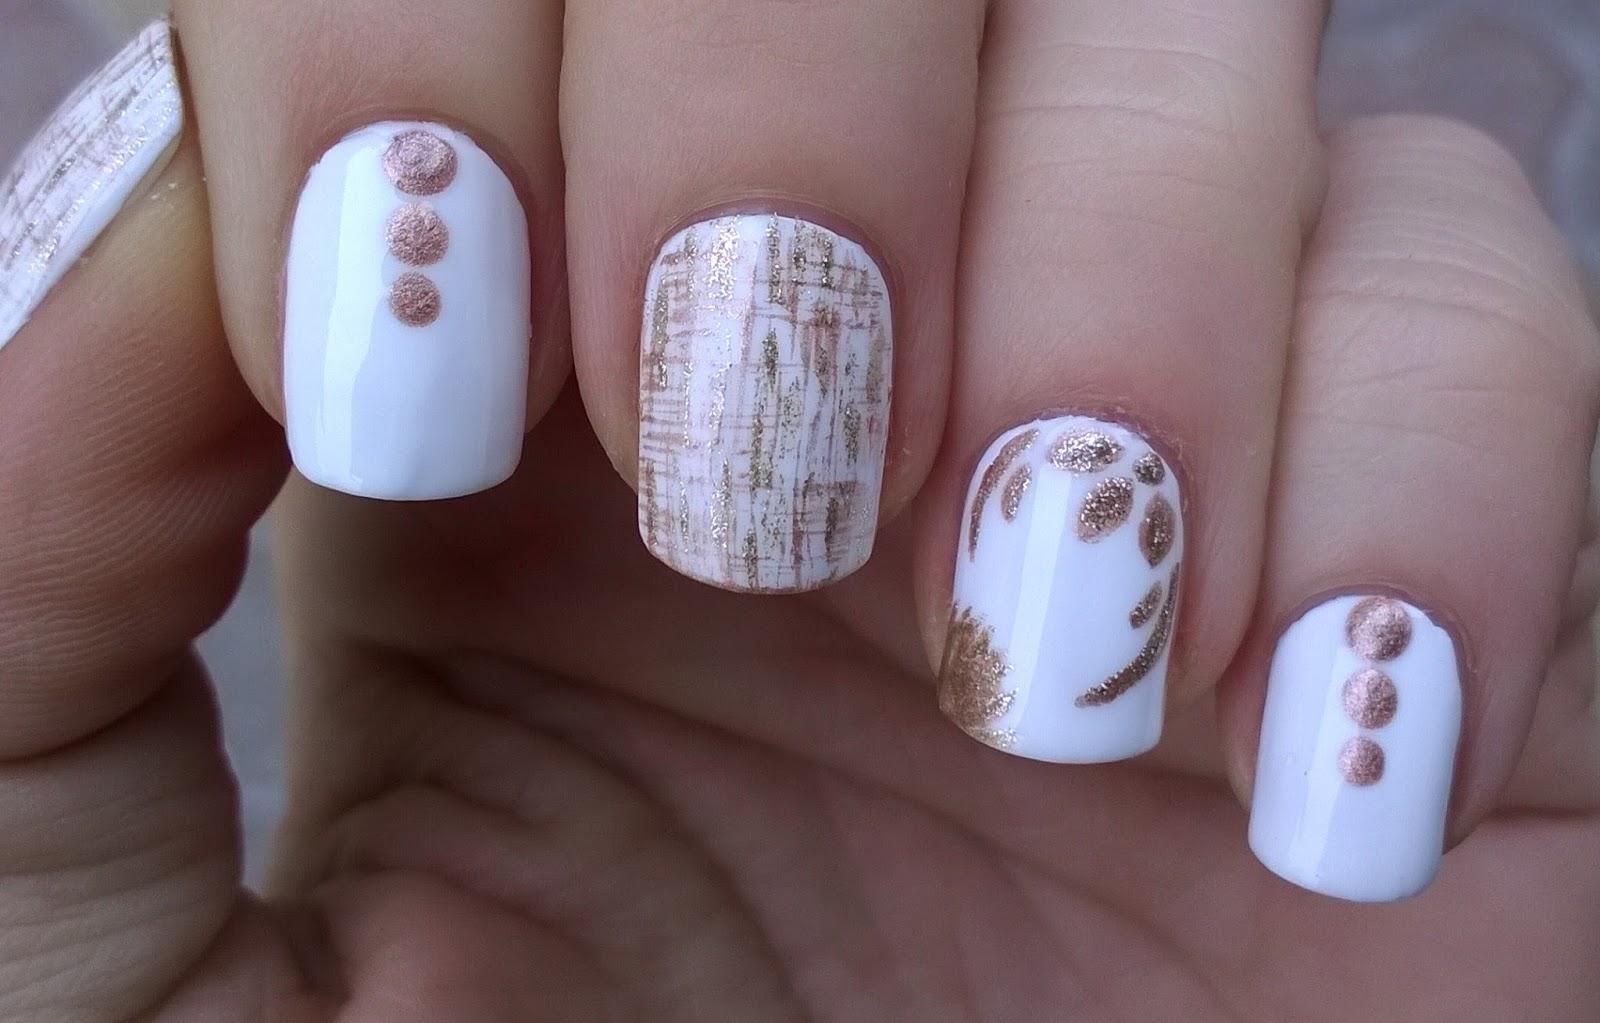 Life world women gold white floral dry brush nail art design gold white floral dry brush nail art design prinsesfo Images